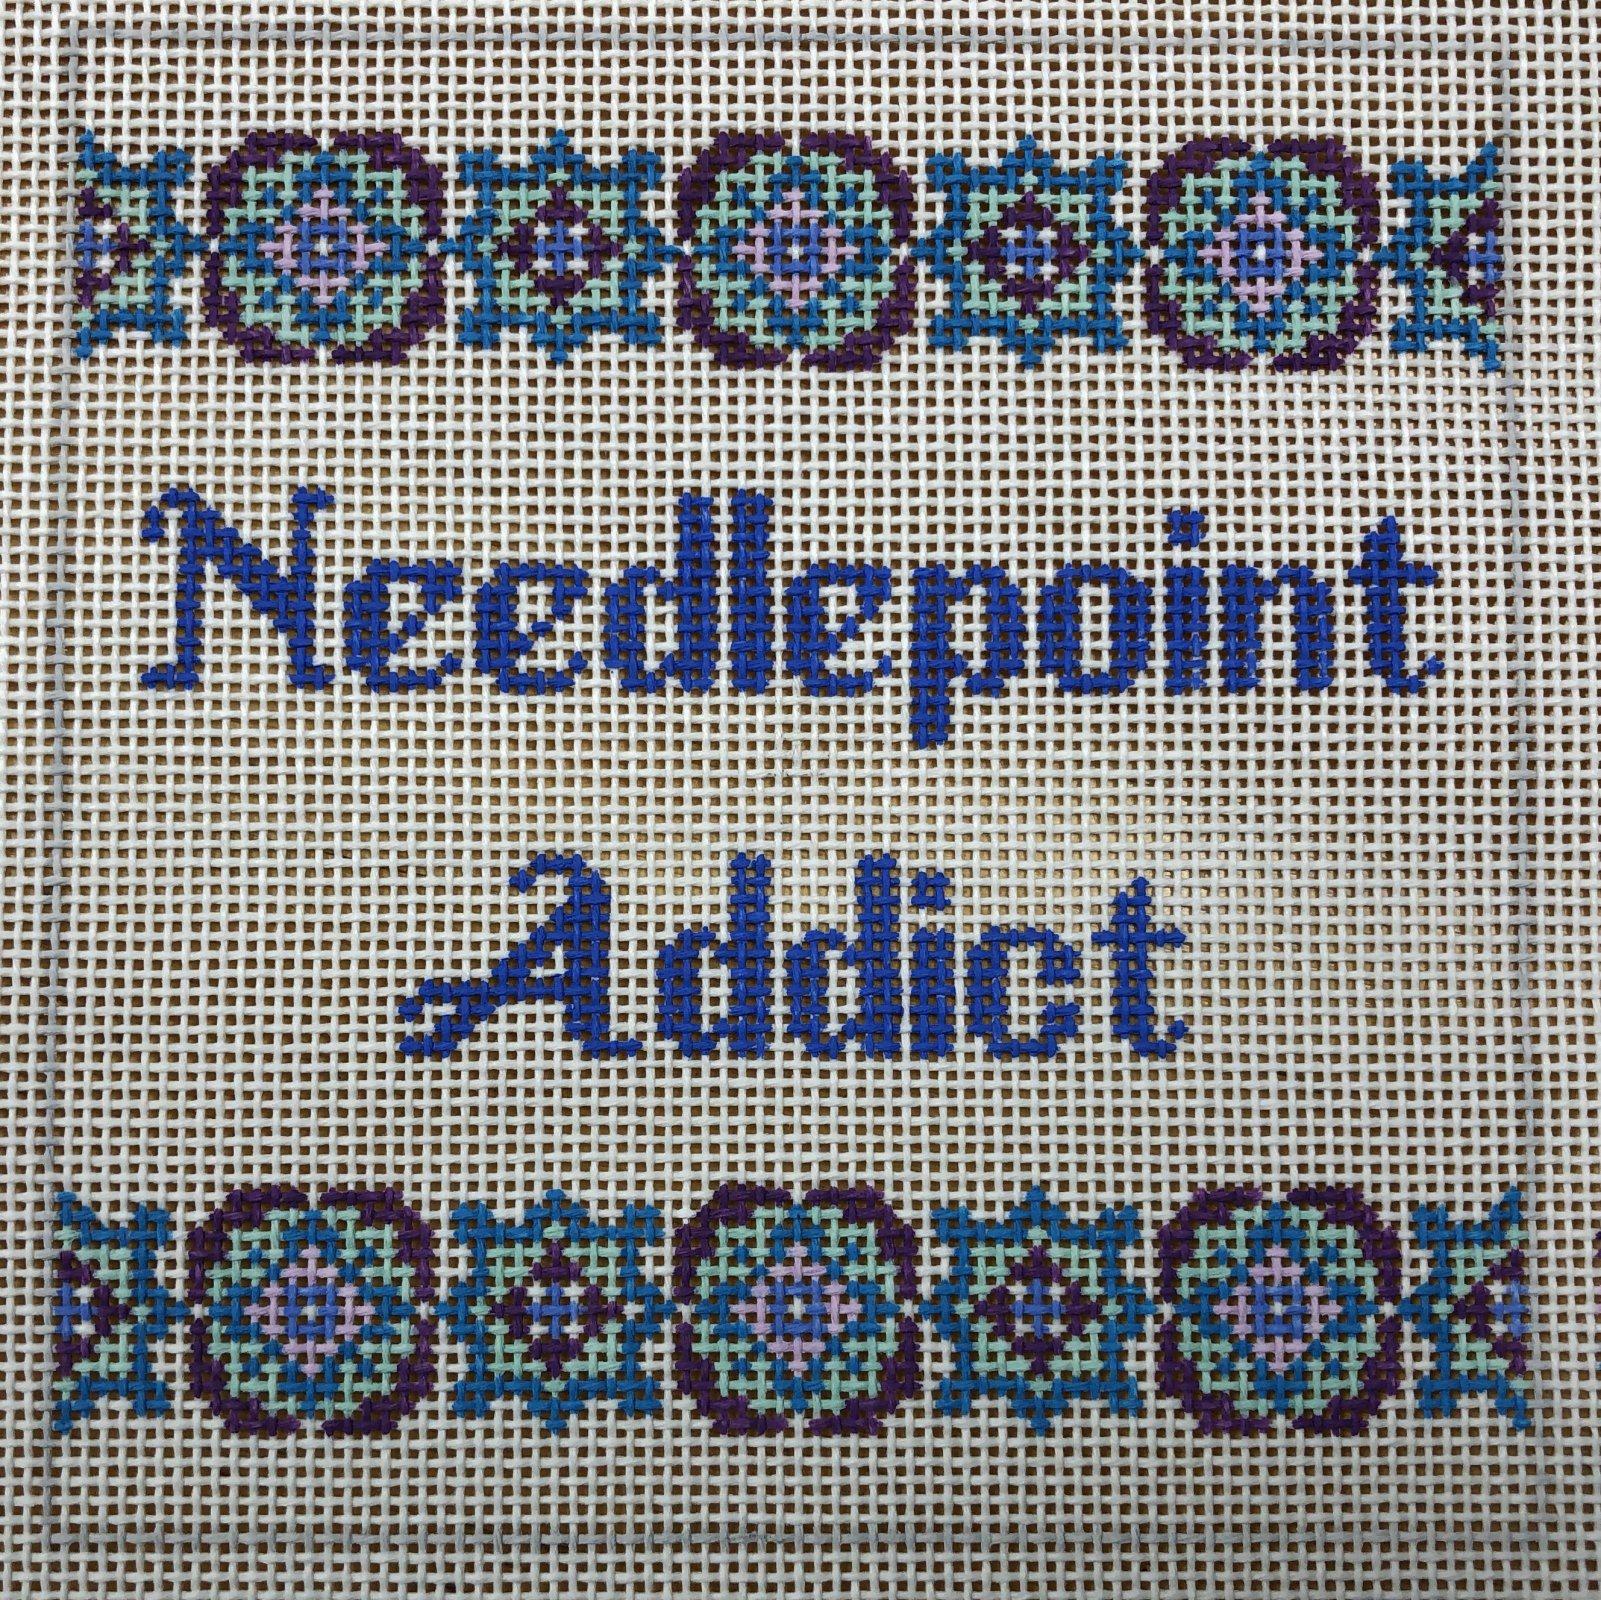 needlepoint addict*